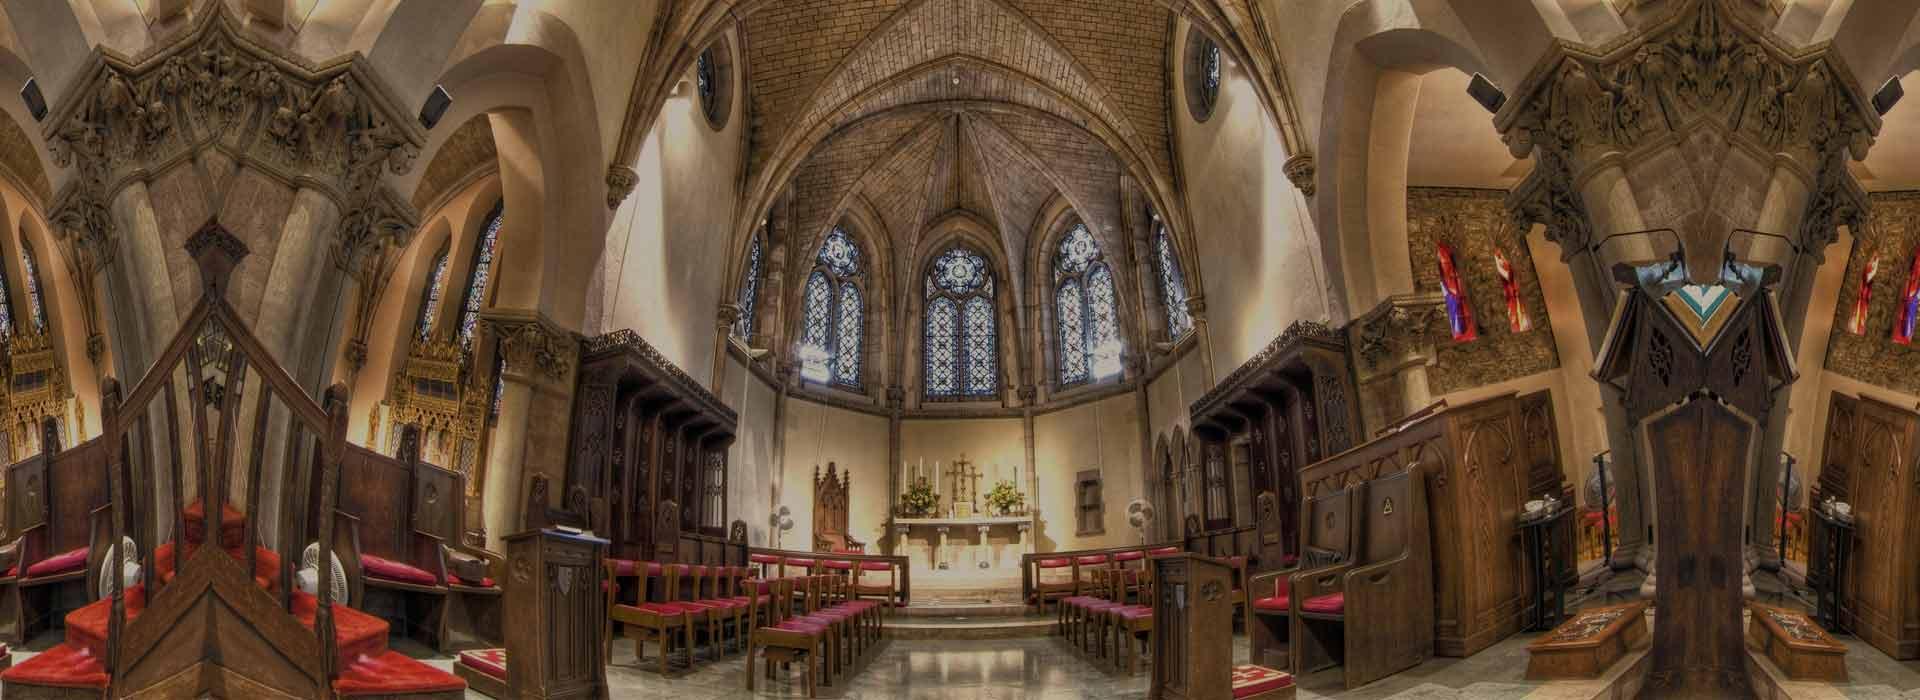 WELCOME TO TRINIRY SANO CHURCH